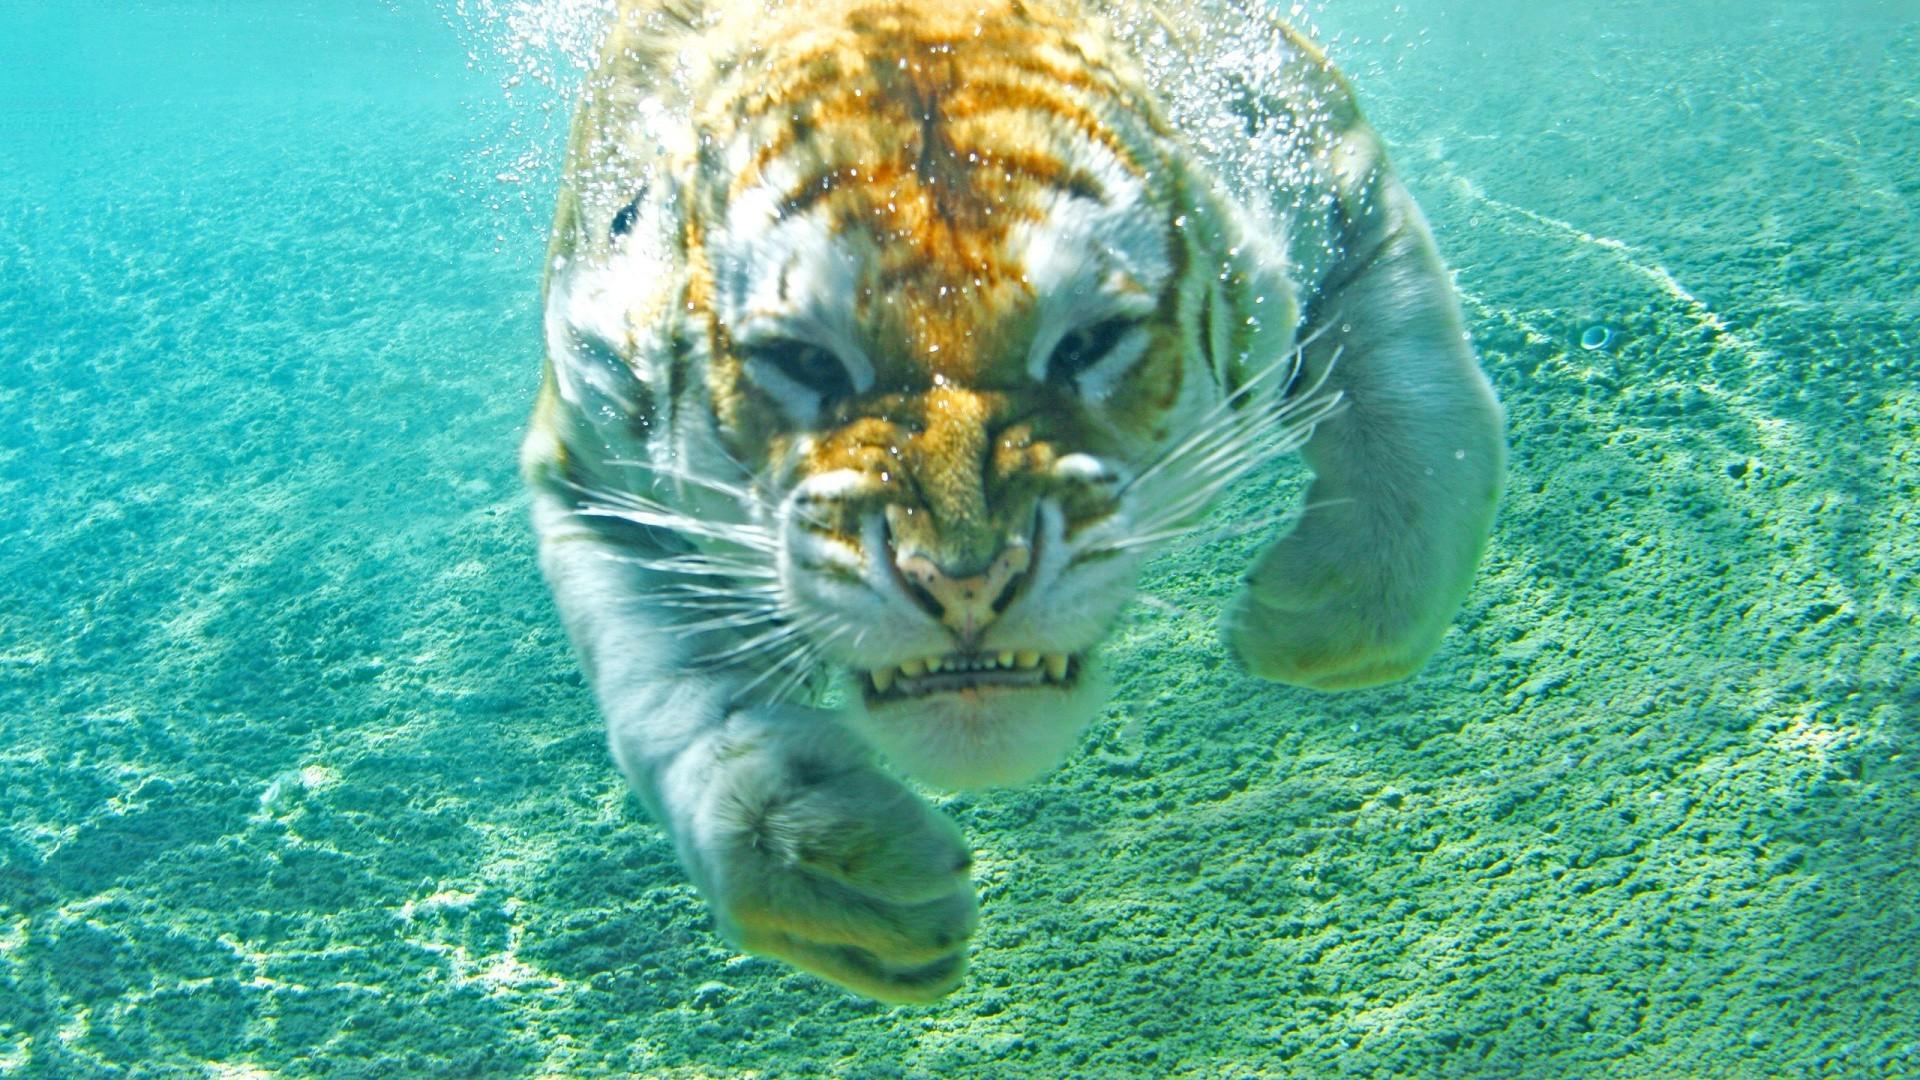 [Jeu] Association d'images Animals-sea-tiger-underwater-biology-fauna-mammal-1920x1080-px-marine-biology-organism-624938